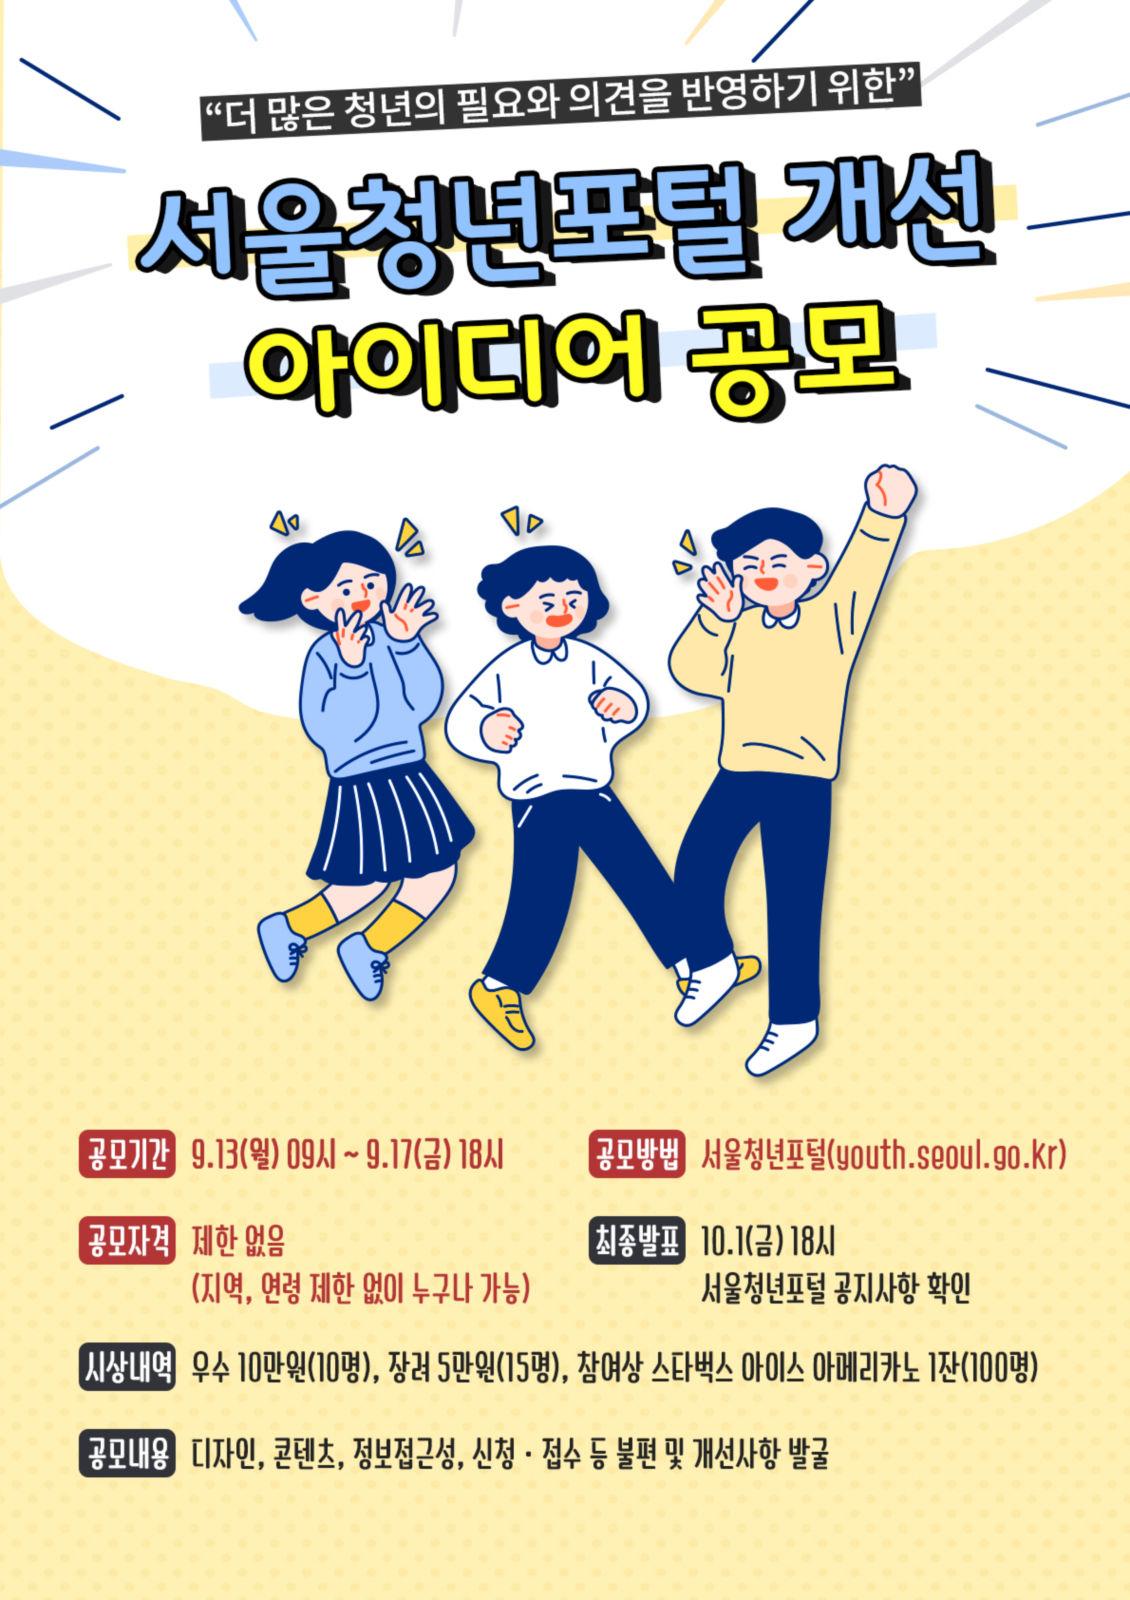 You are currently viewing 서울시, 서울청년포털 어떻게 개선하면 좋을까요?… 시민 아이디어 공모